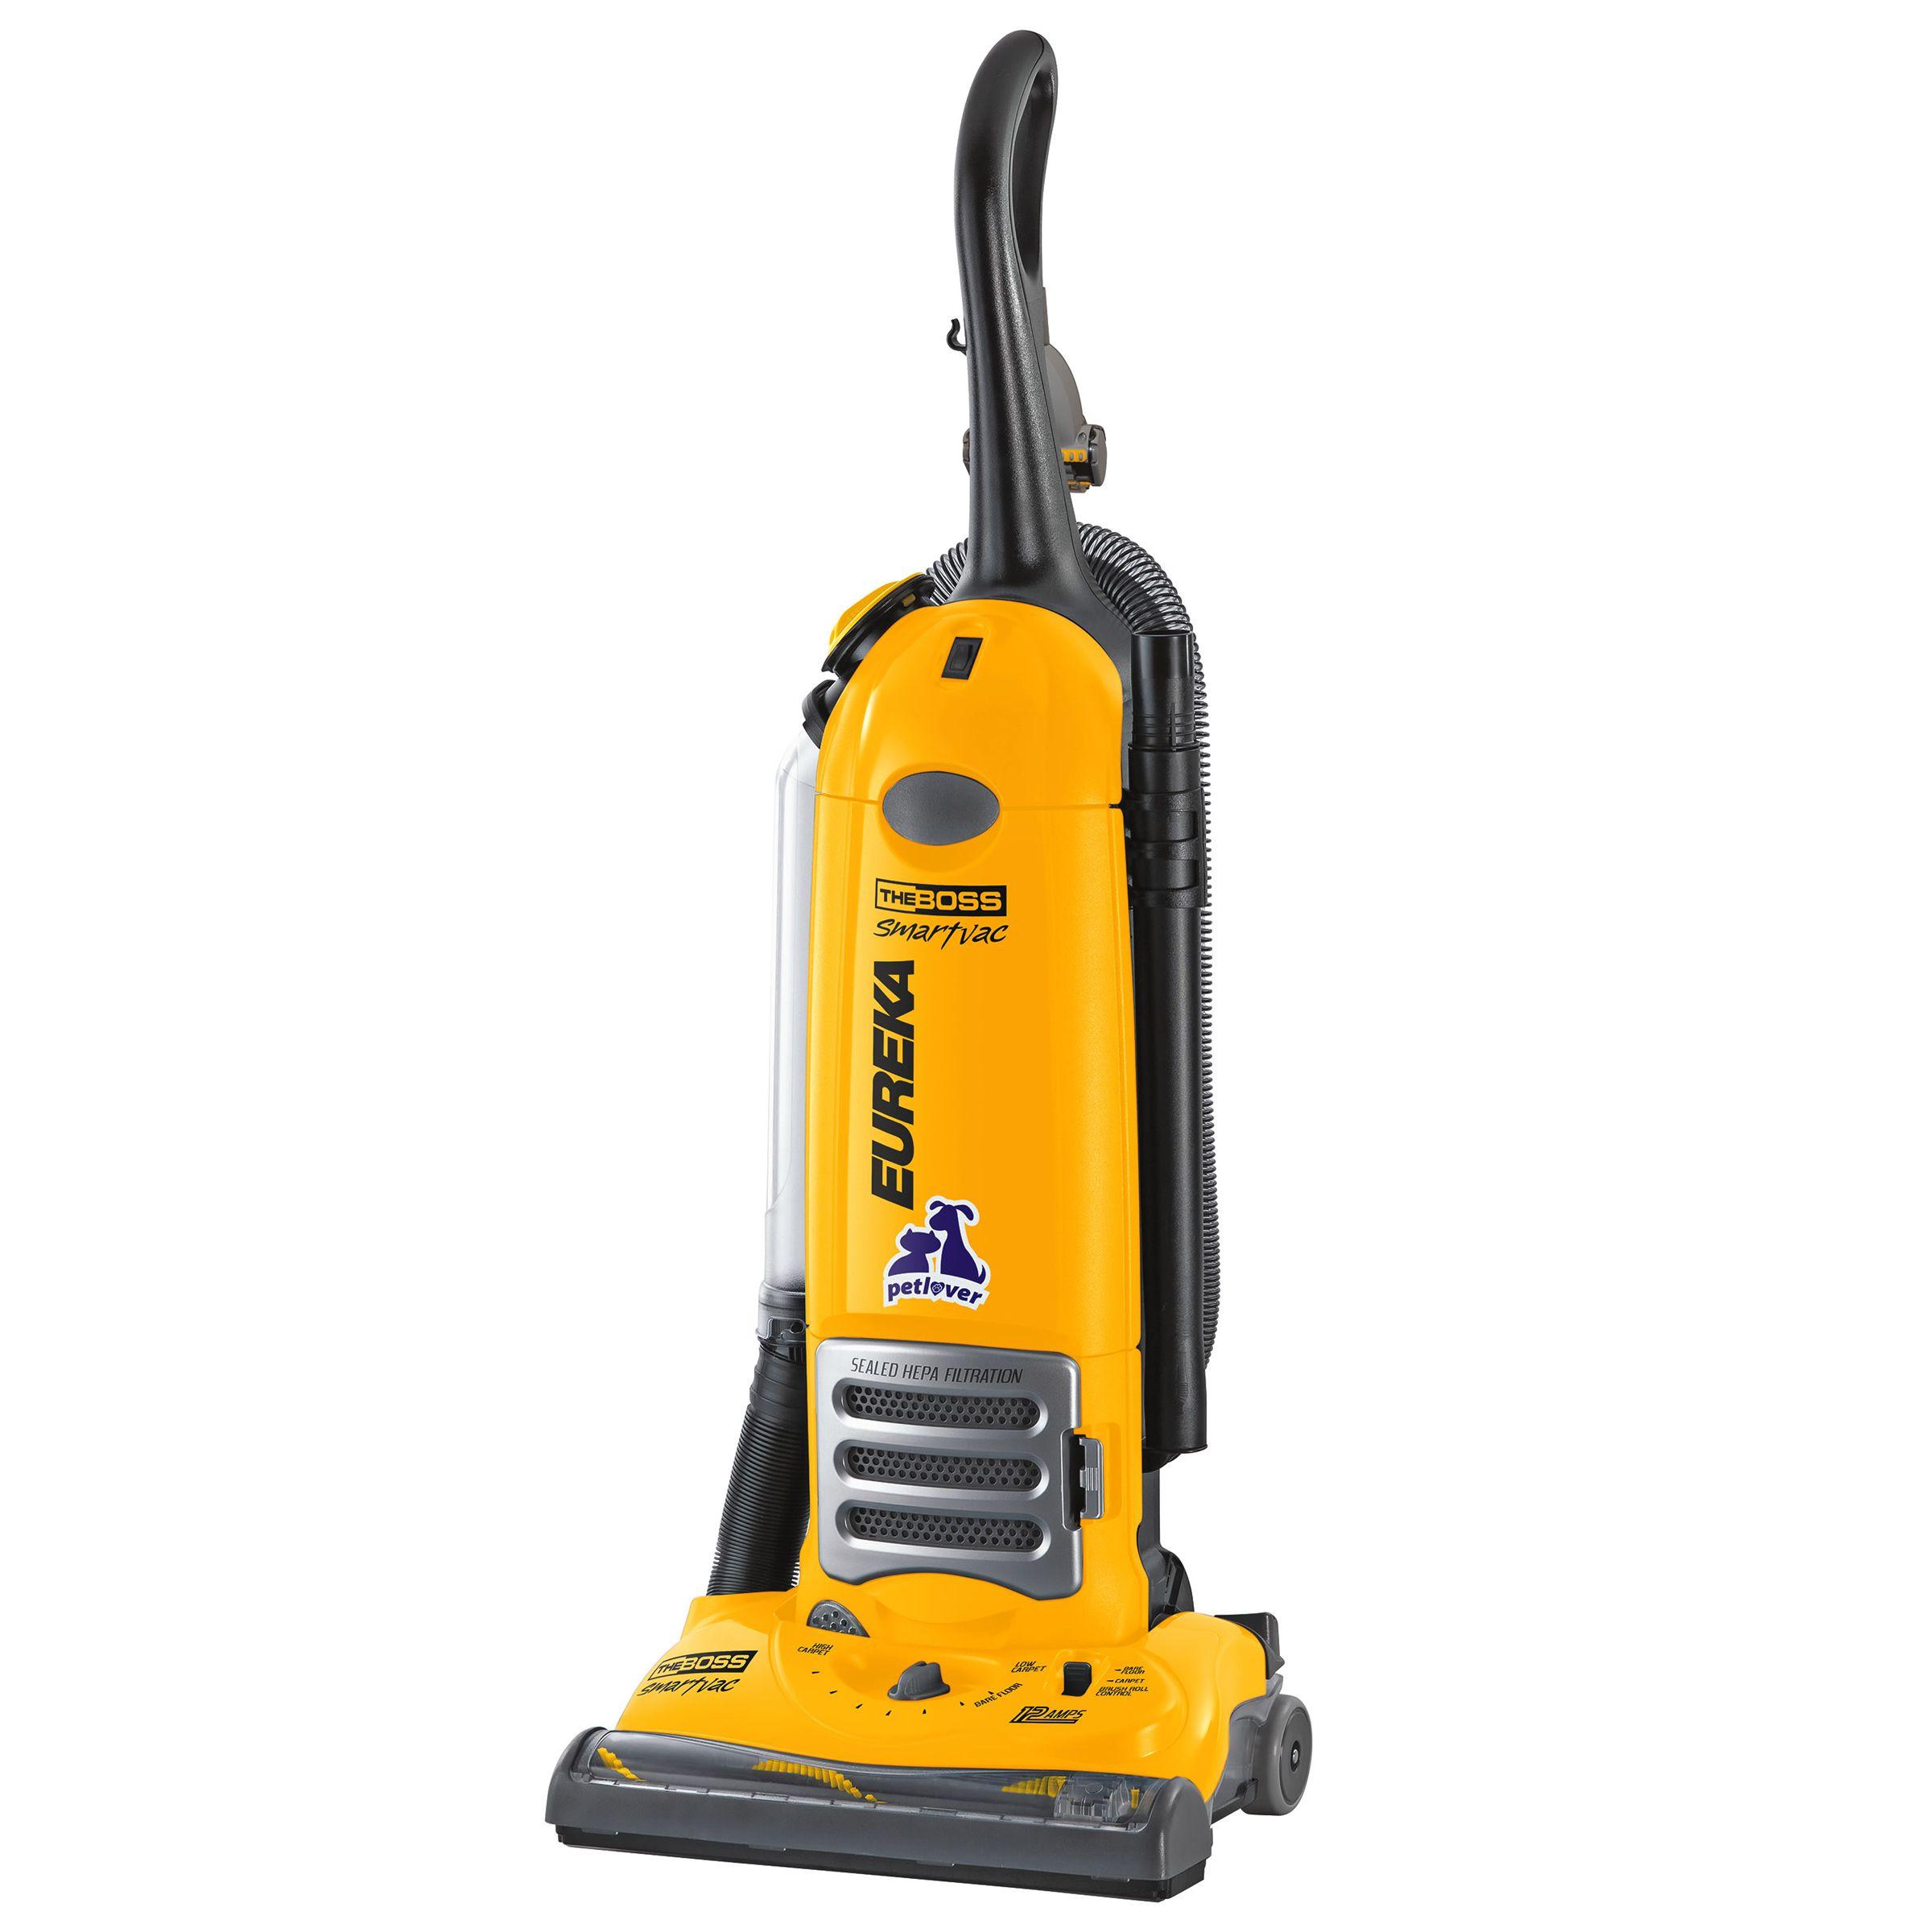 Eureka Boss SmartVacuum Pet Lover Upright Vacuum Cleaner